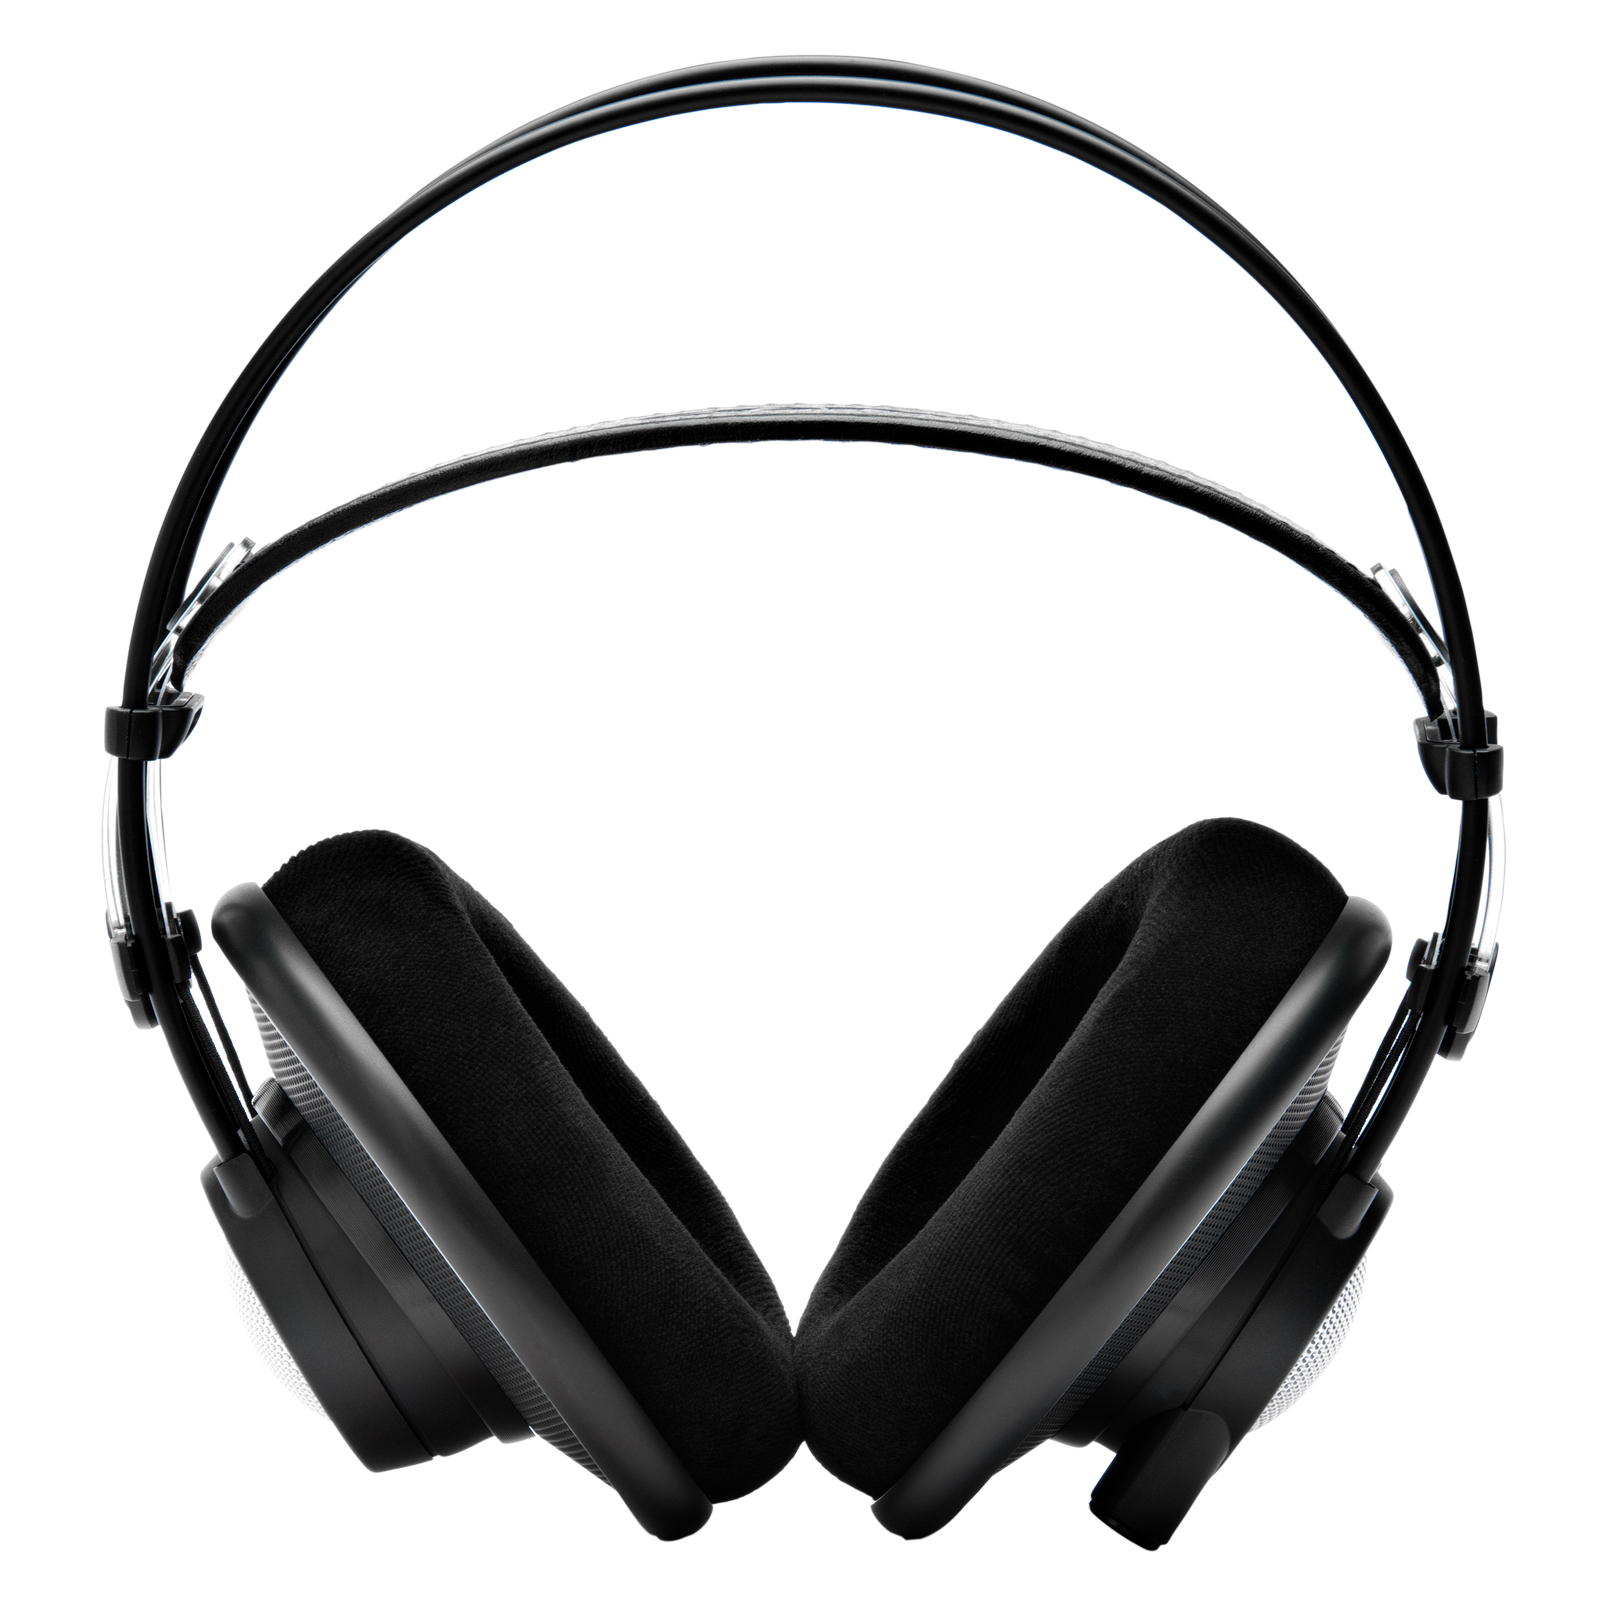 K702 - Black - Reference studio headphones - Front